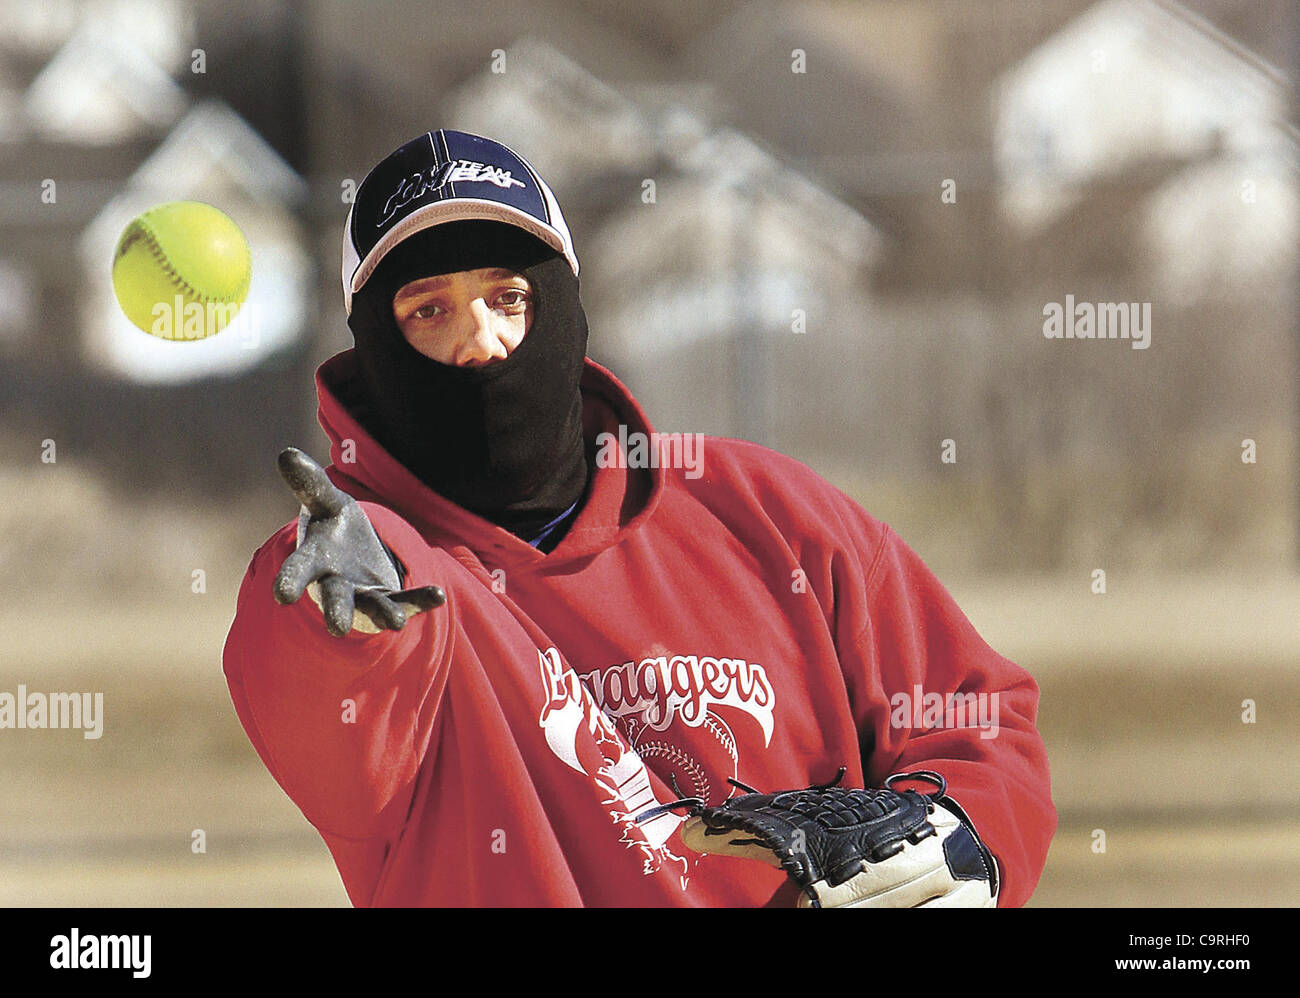 Feb. 12, 2012 - Davenport, Iowa, U.S. - Adam Jackson of Rock Island, Ill., pitches the softball Sunday during the - Stock Image